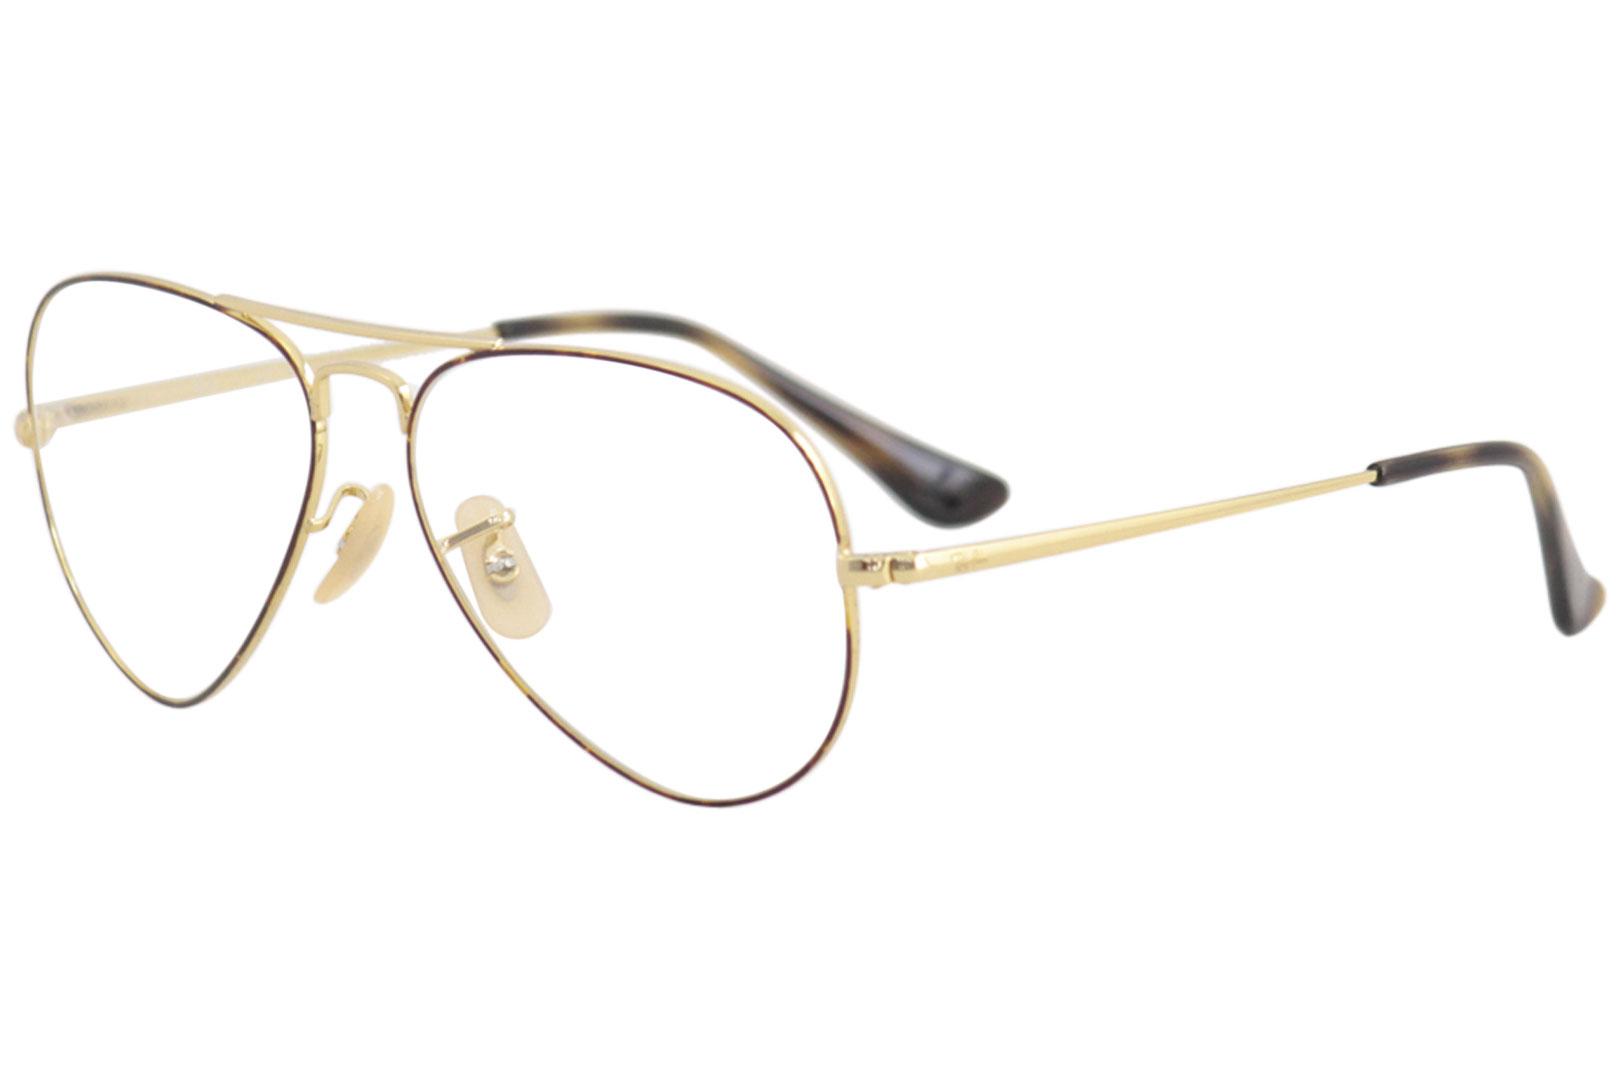 3dbf13809f Ray Ban Eyeglasses RB6489 RX 6489 2945 Havana Gold RayBan Optical ...